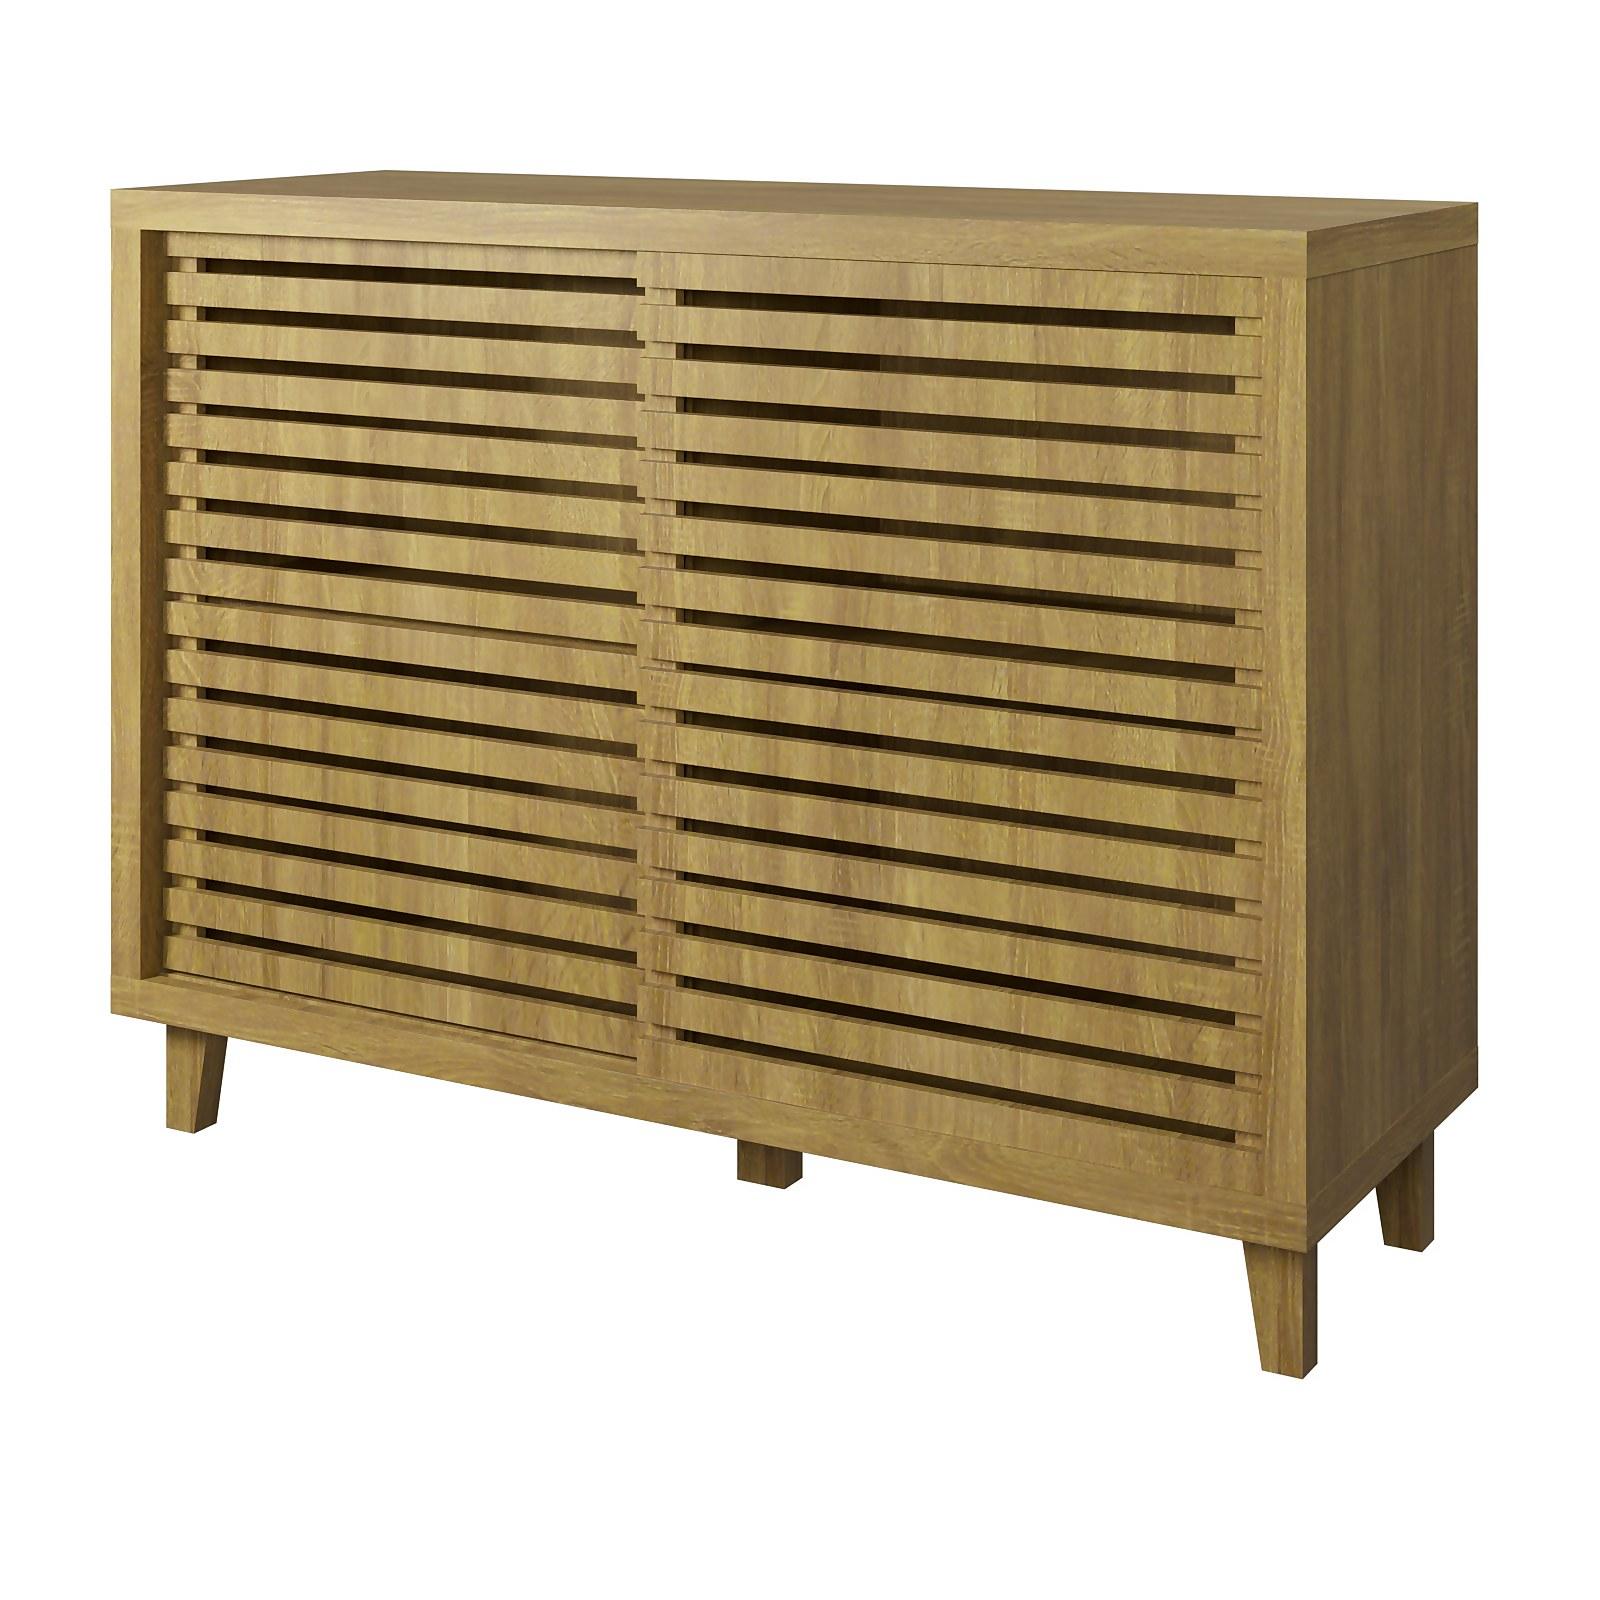 Sideboard with Sliding Doors - Mango Oak